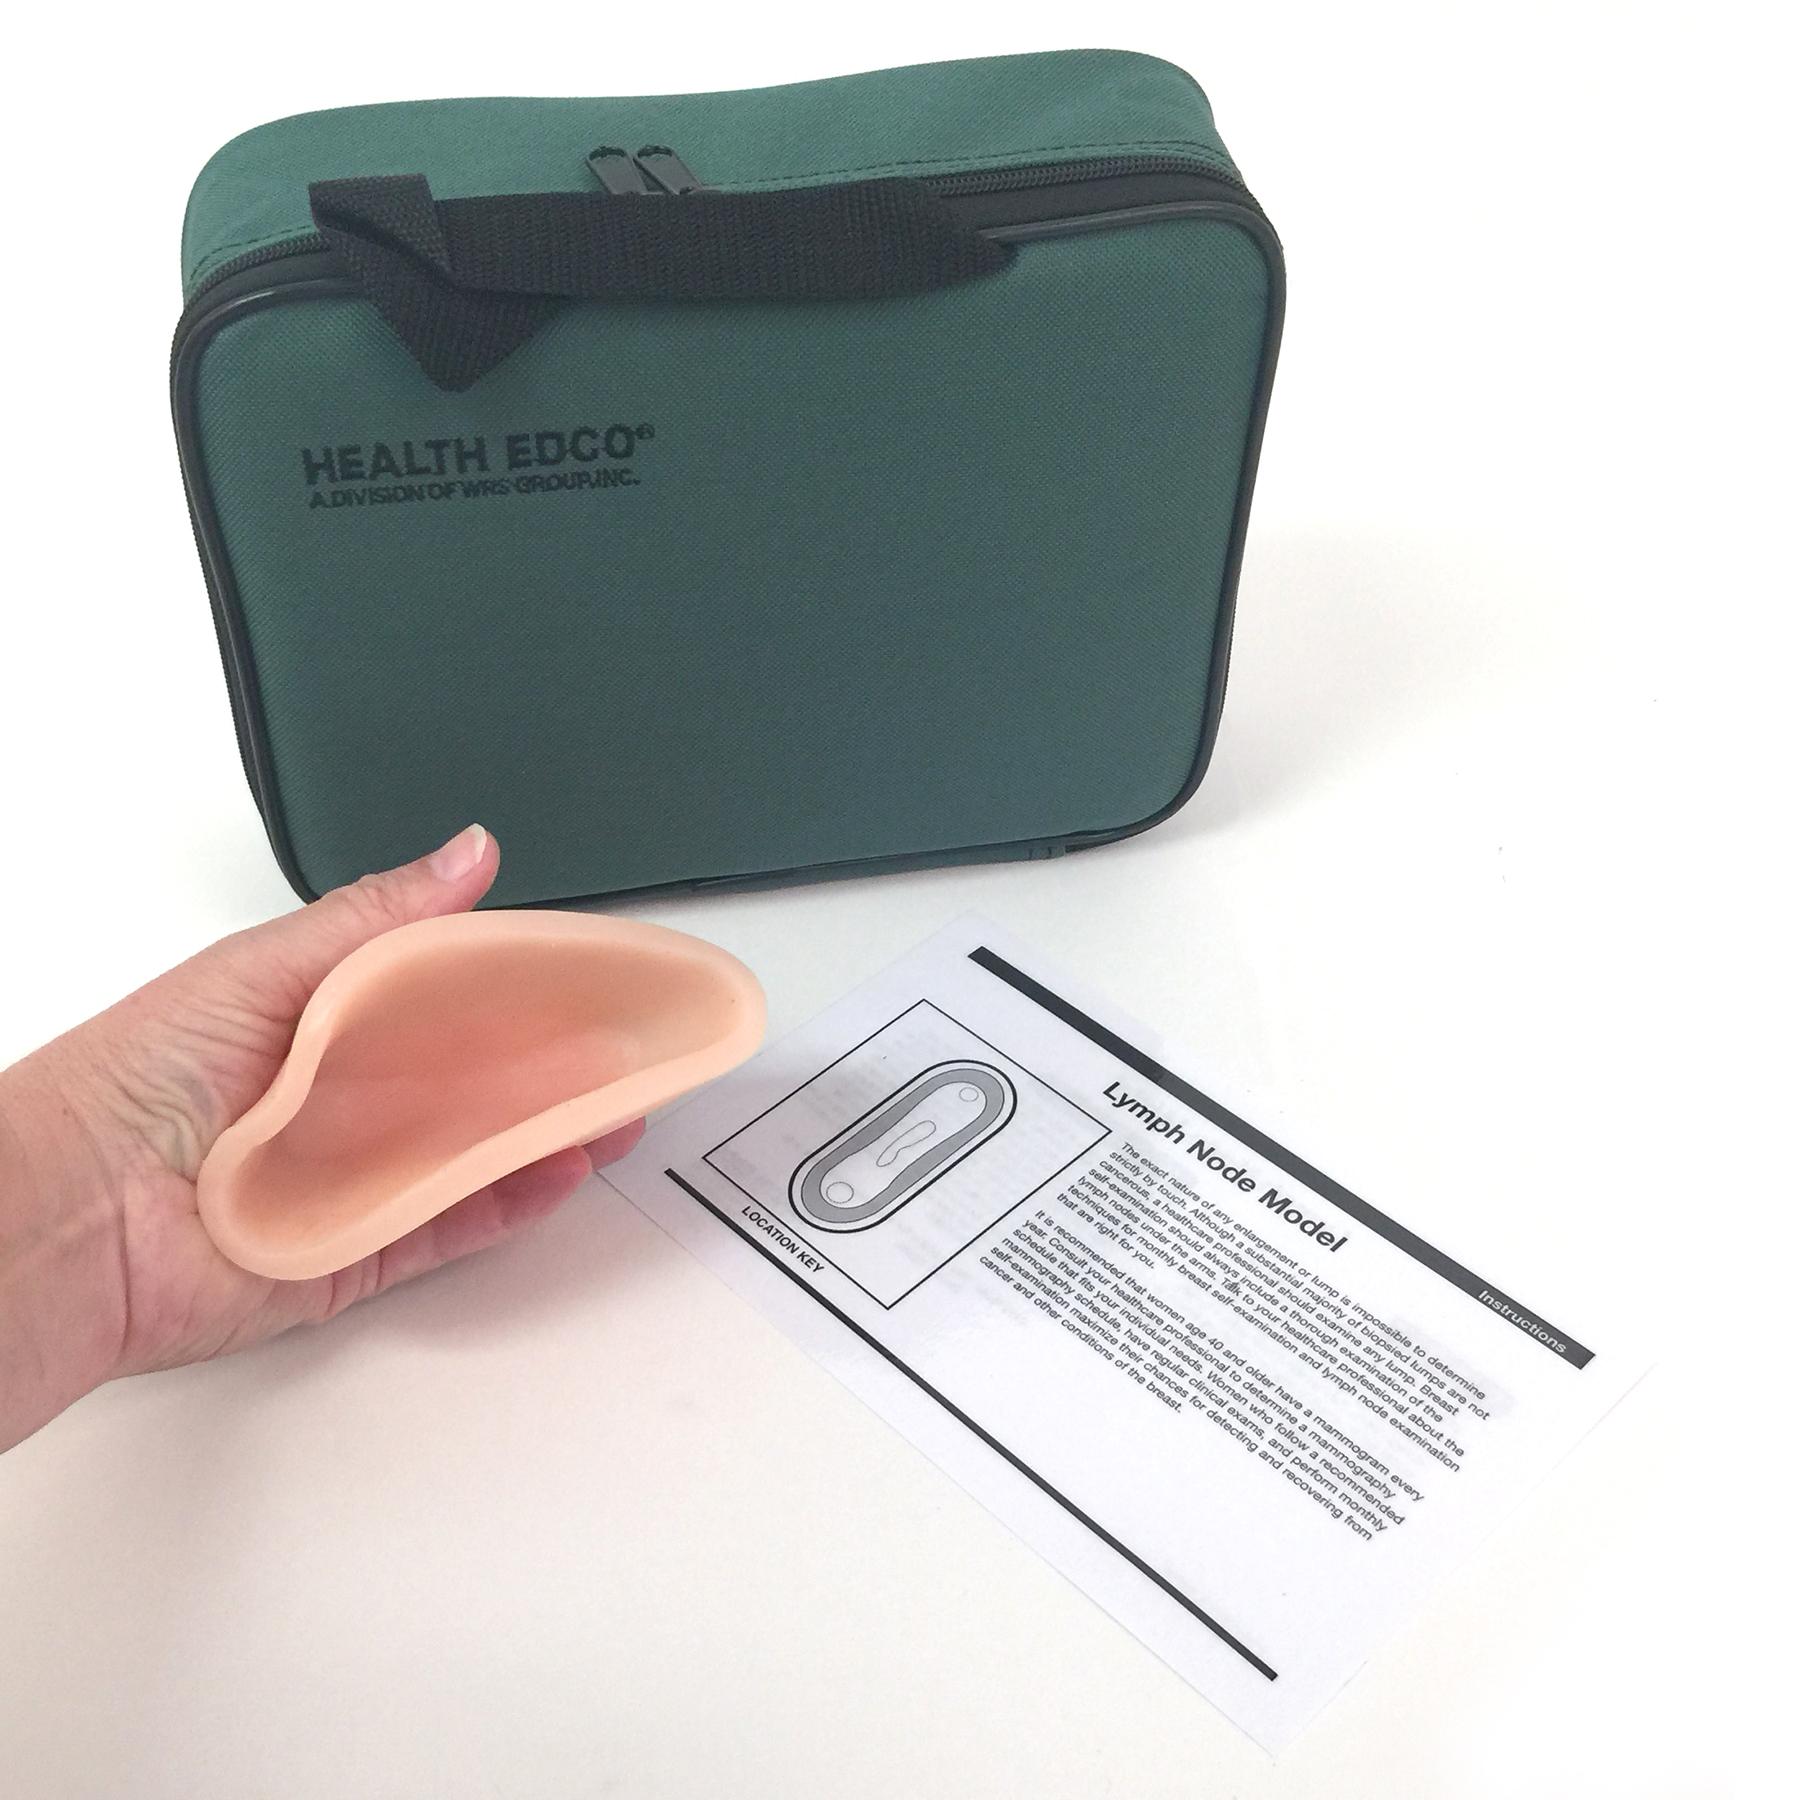 Lymph Node Model, beige lymph node model green carrying case instructions, Health Edco, 26575